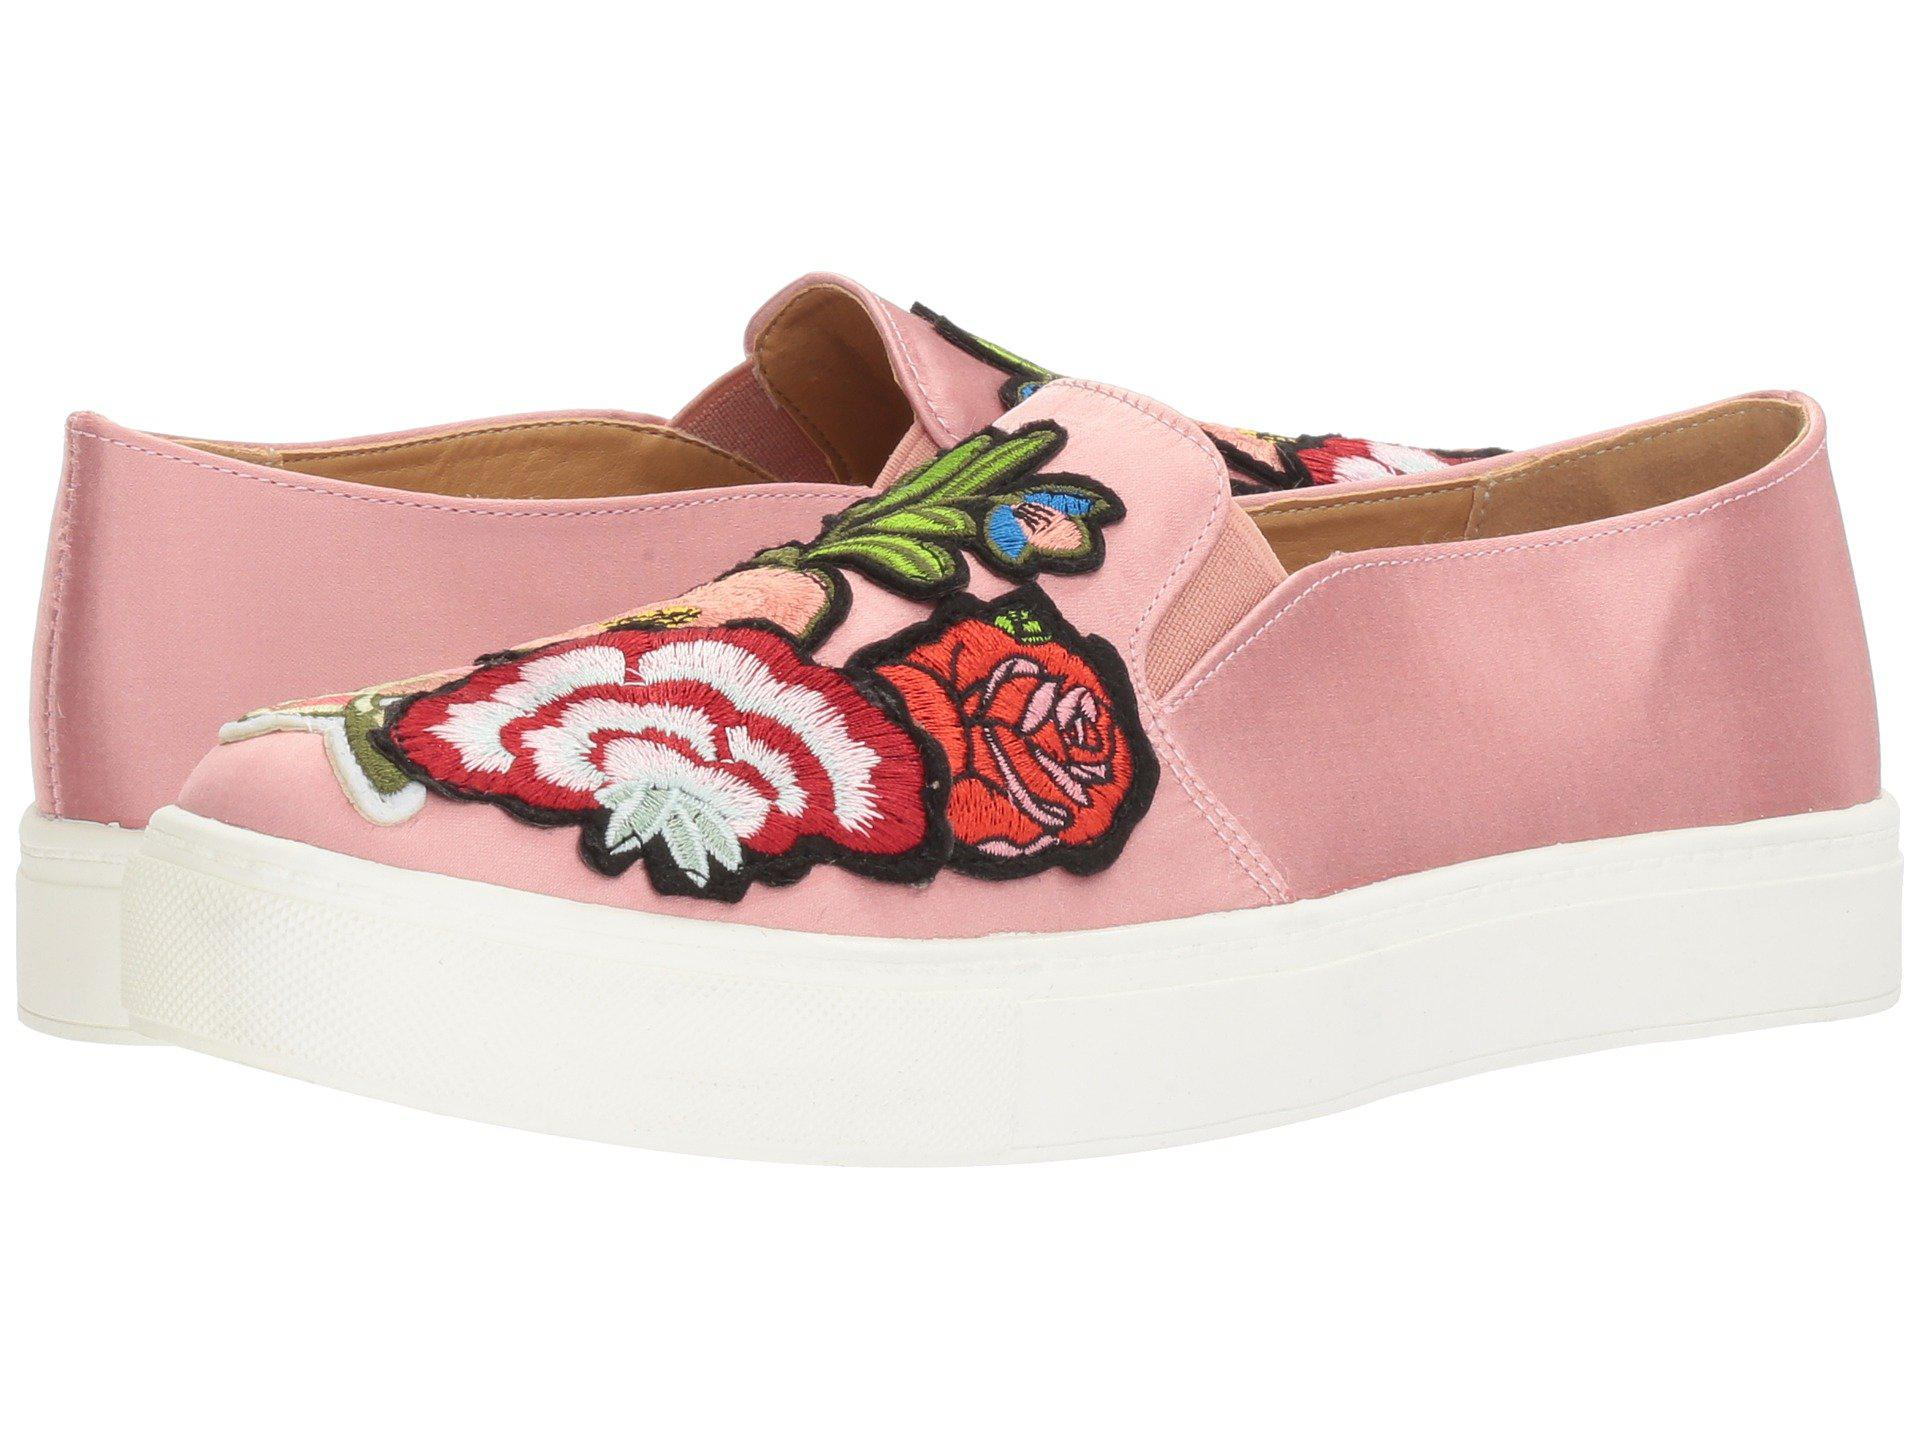 e8b378c4a0ba25 Lyst - Dirty Laundry Joon Satin Fashion Sneaker in Pink